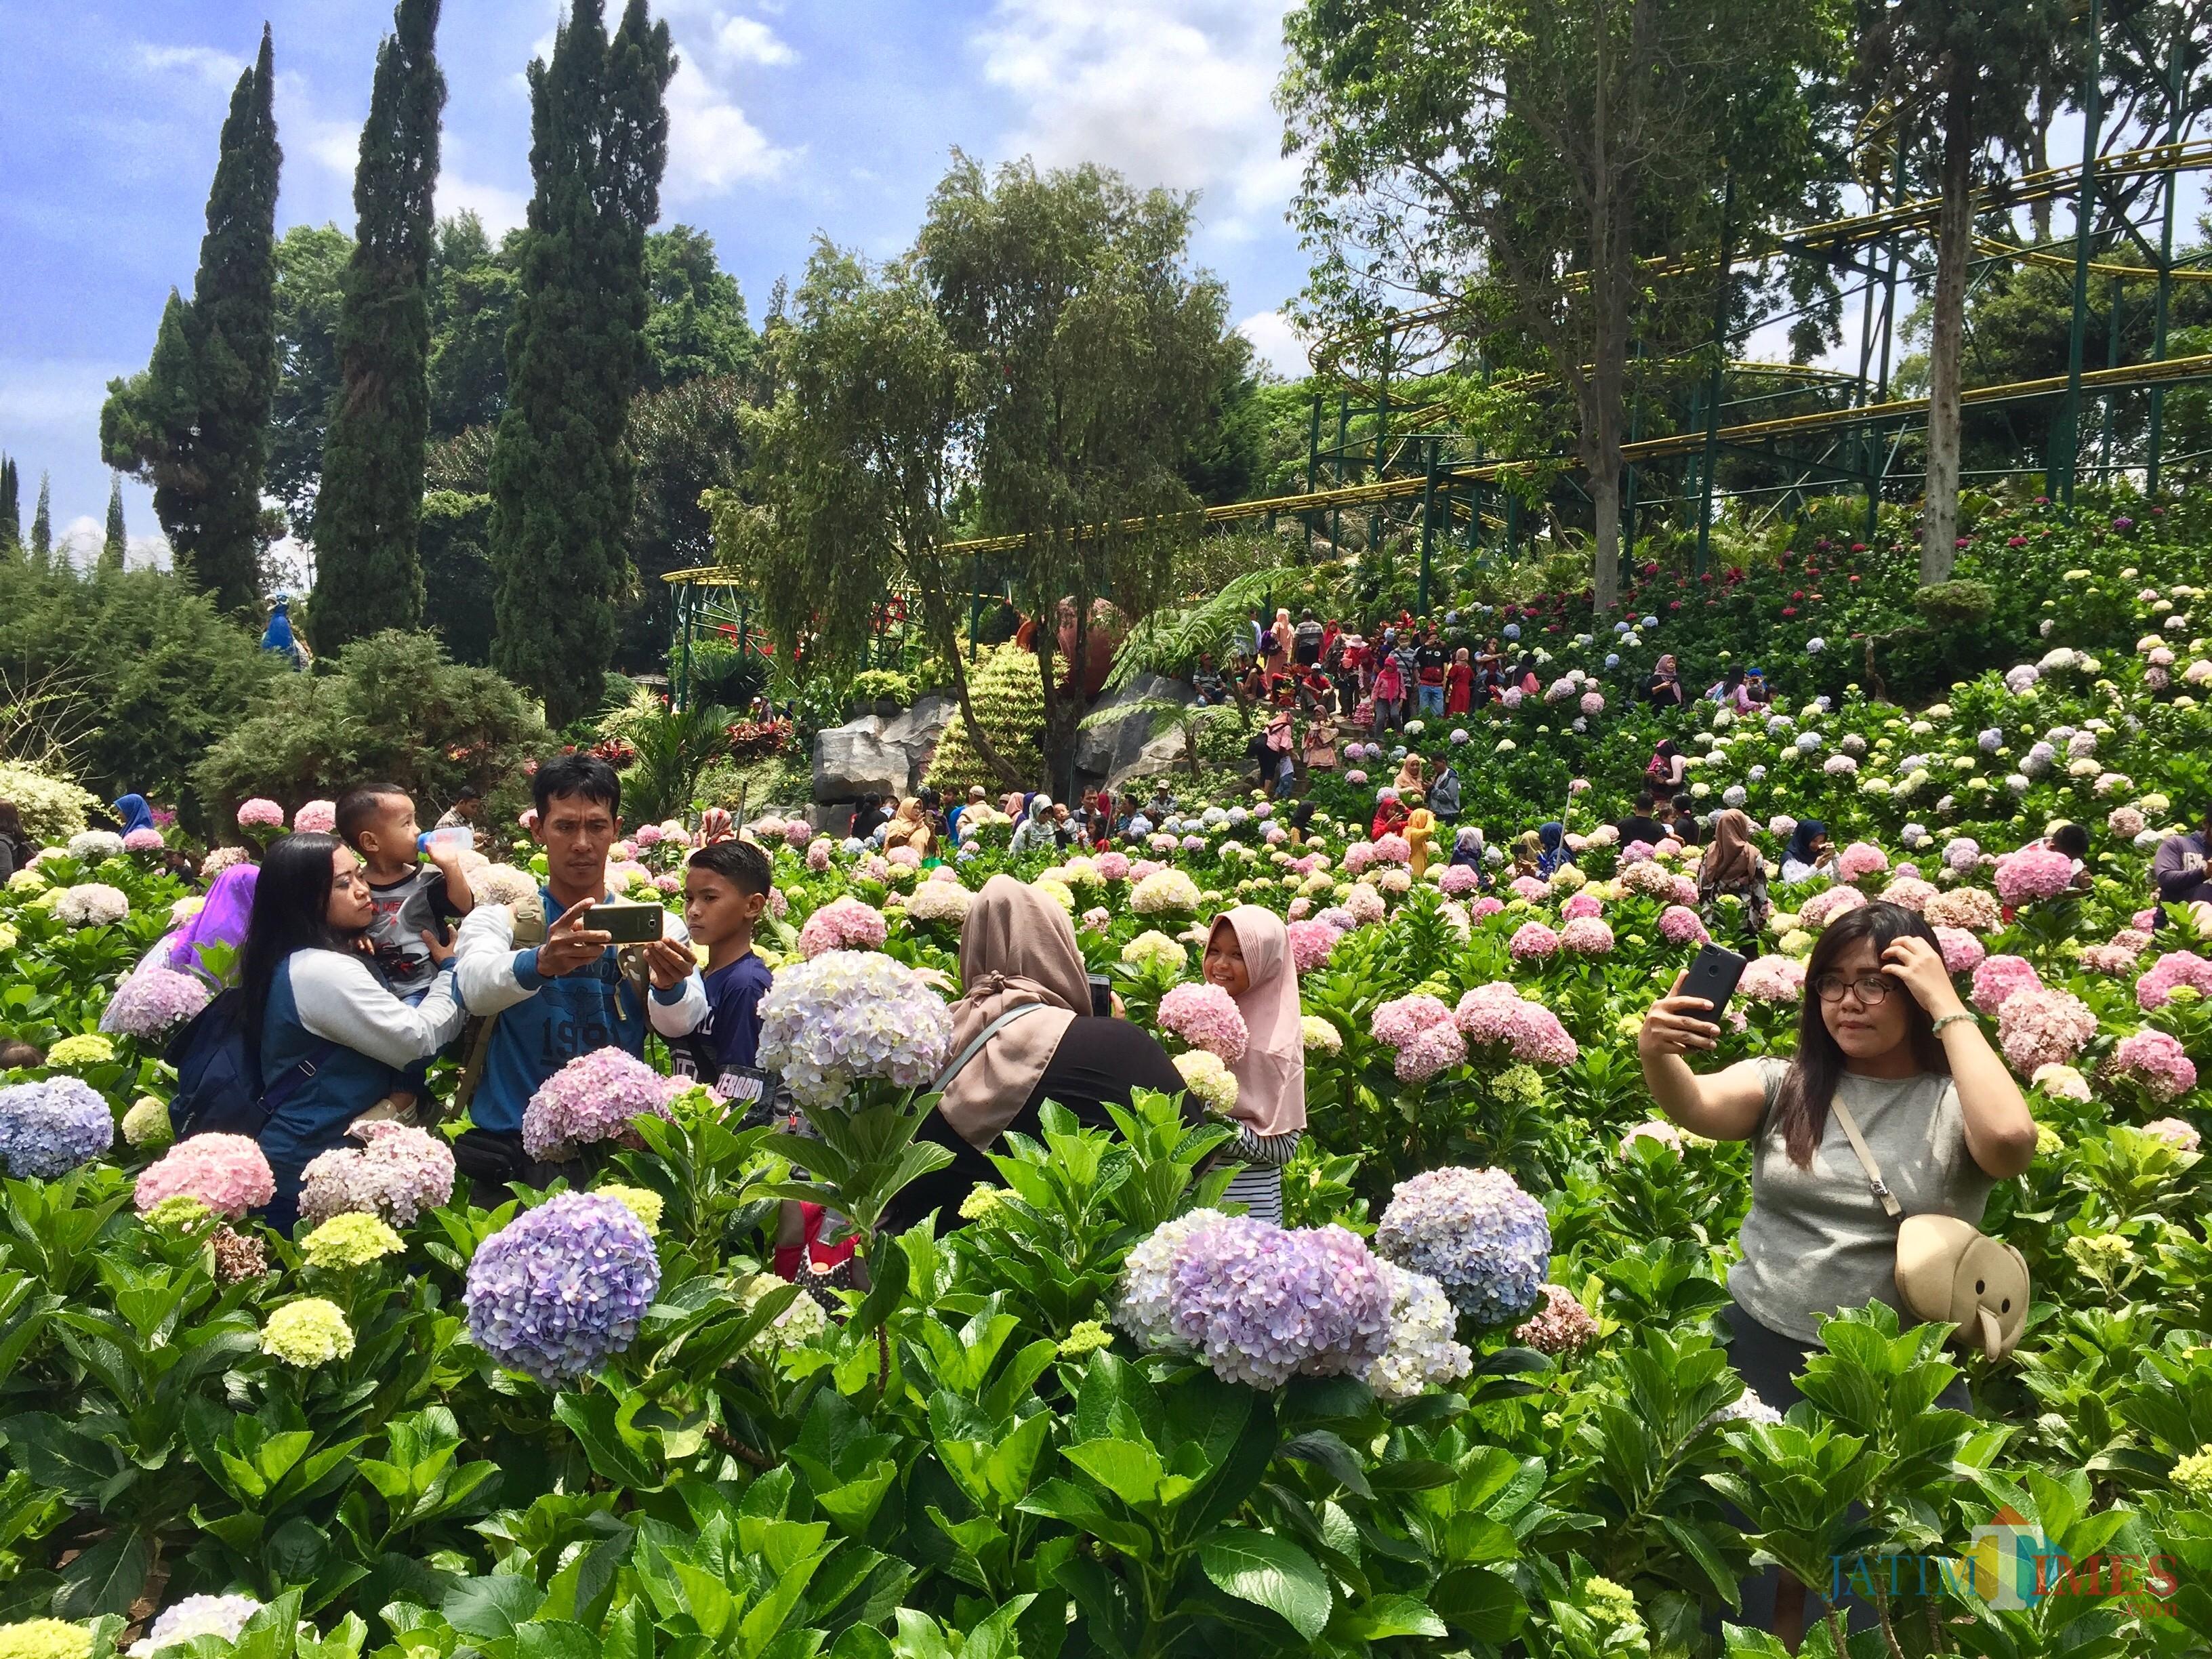 Para wisatawan yang sedang swafoto di area taman bungan Selecta, Minggu (11/11/2018). (Foto: Irsya Richa/MalangTIMES)